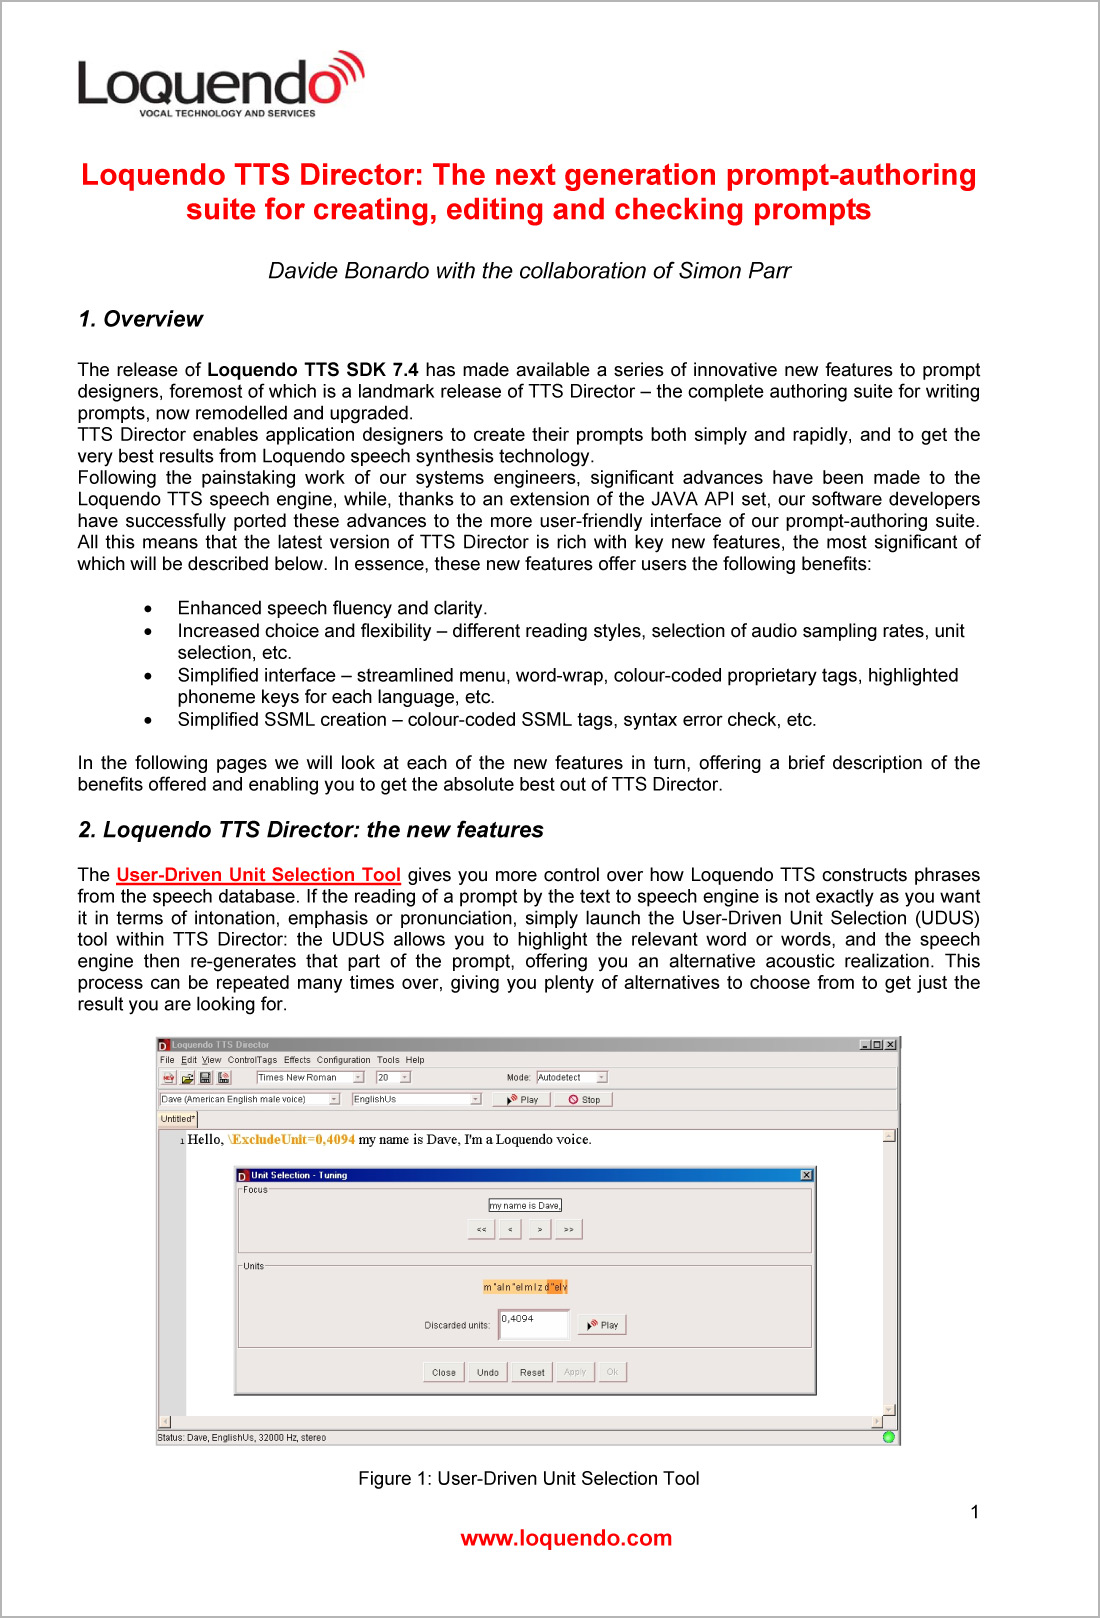 loquendo_TTS_director_specification